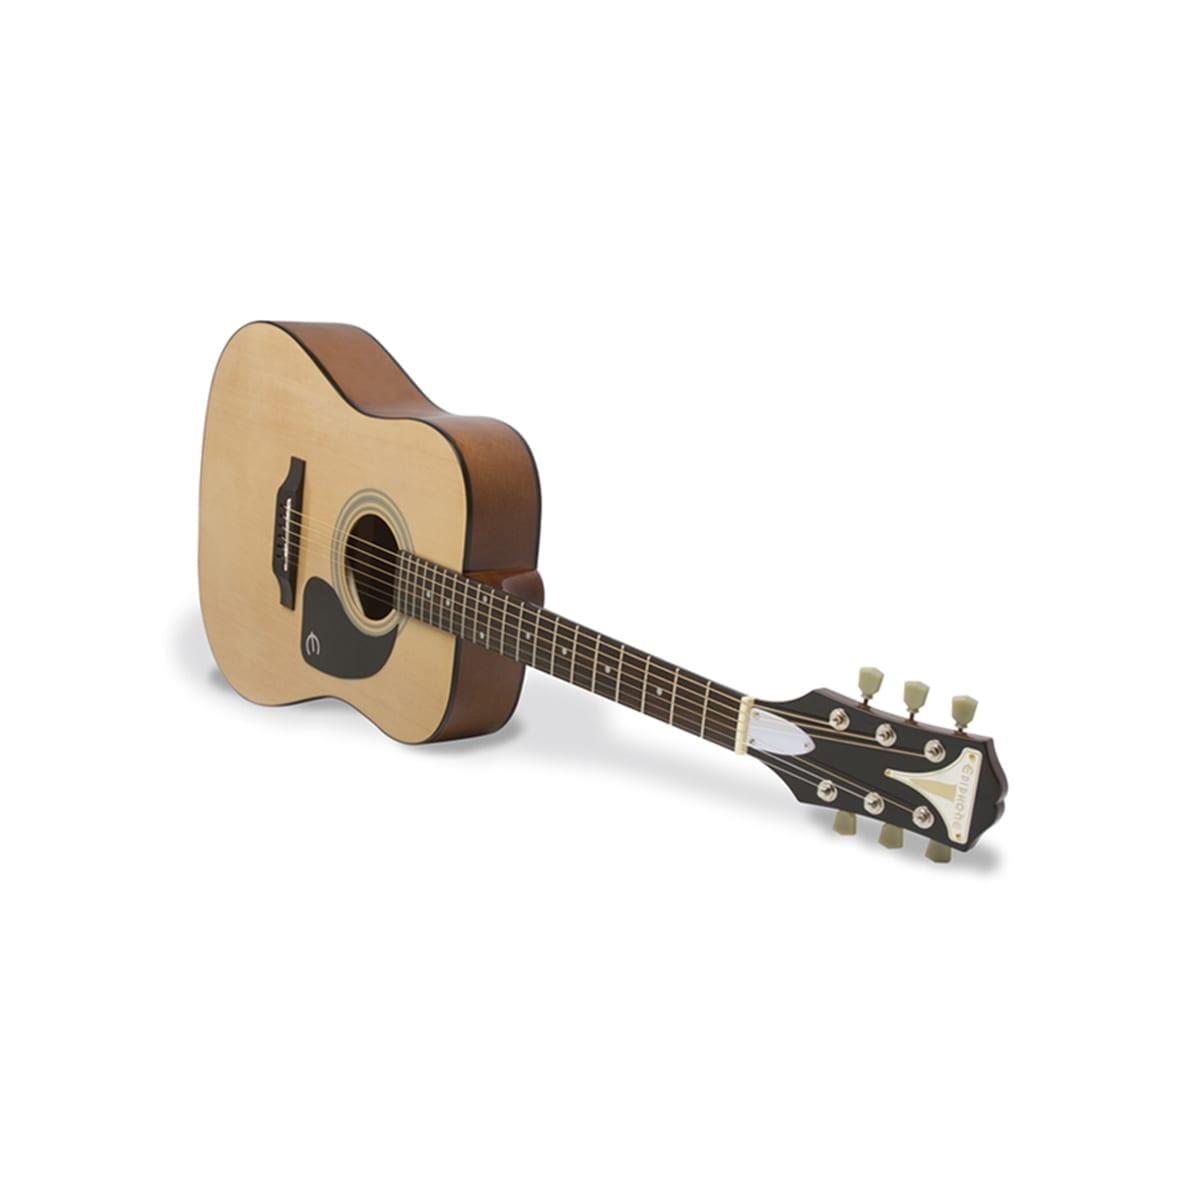 Epiphone Pro 1 Acoustic Natural